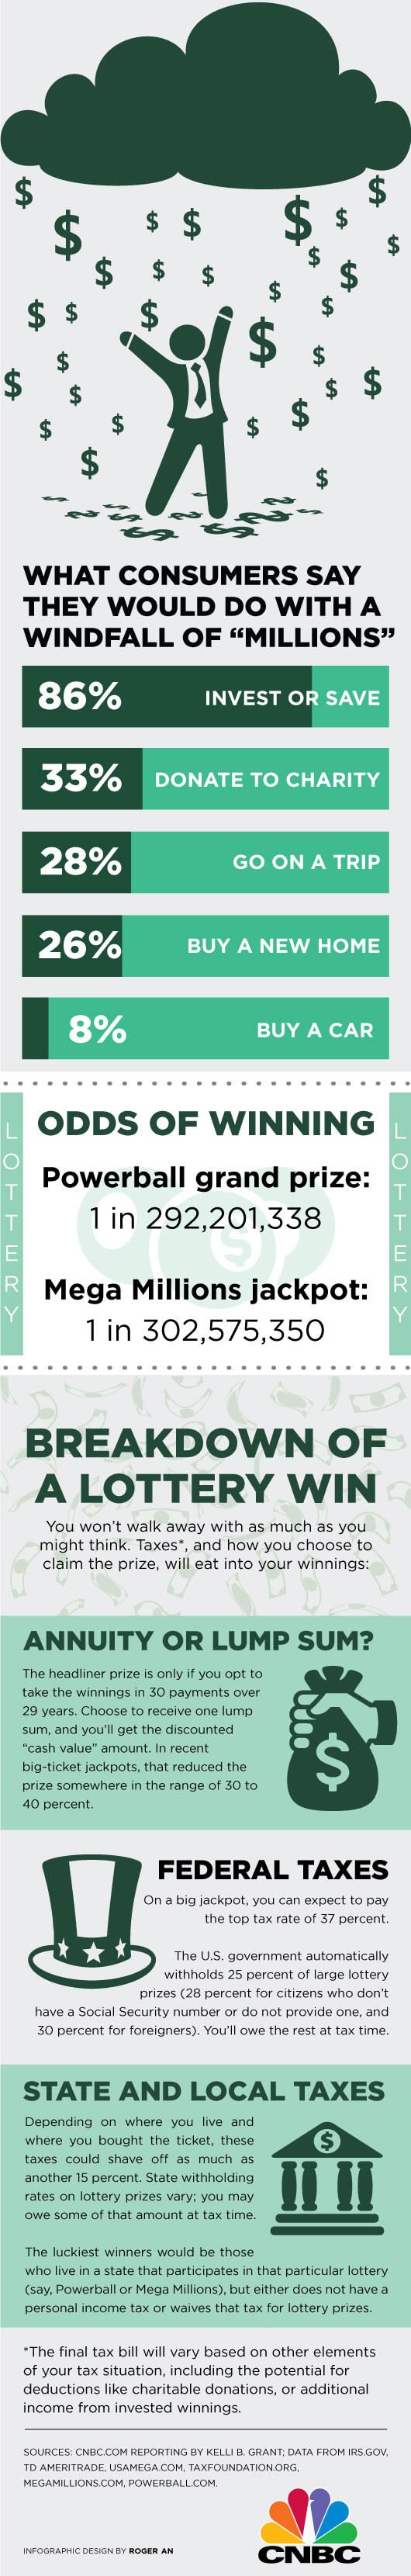 lottery-survey-cnbc (1).jpg